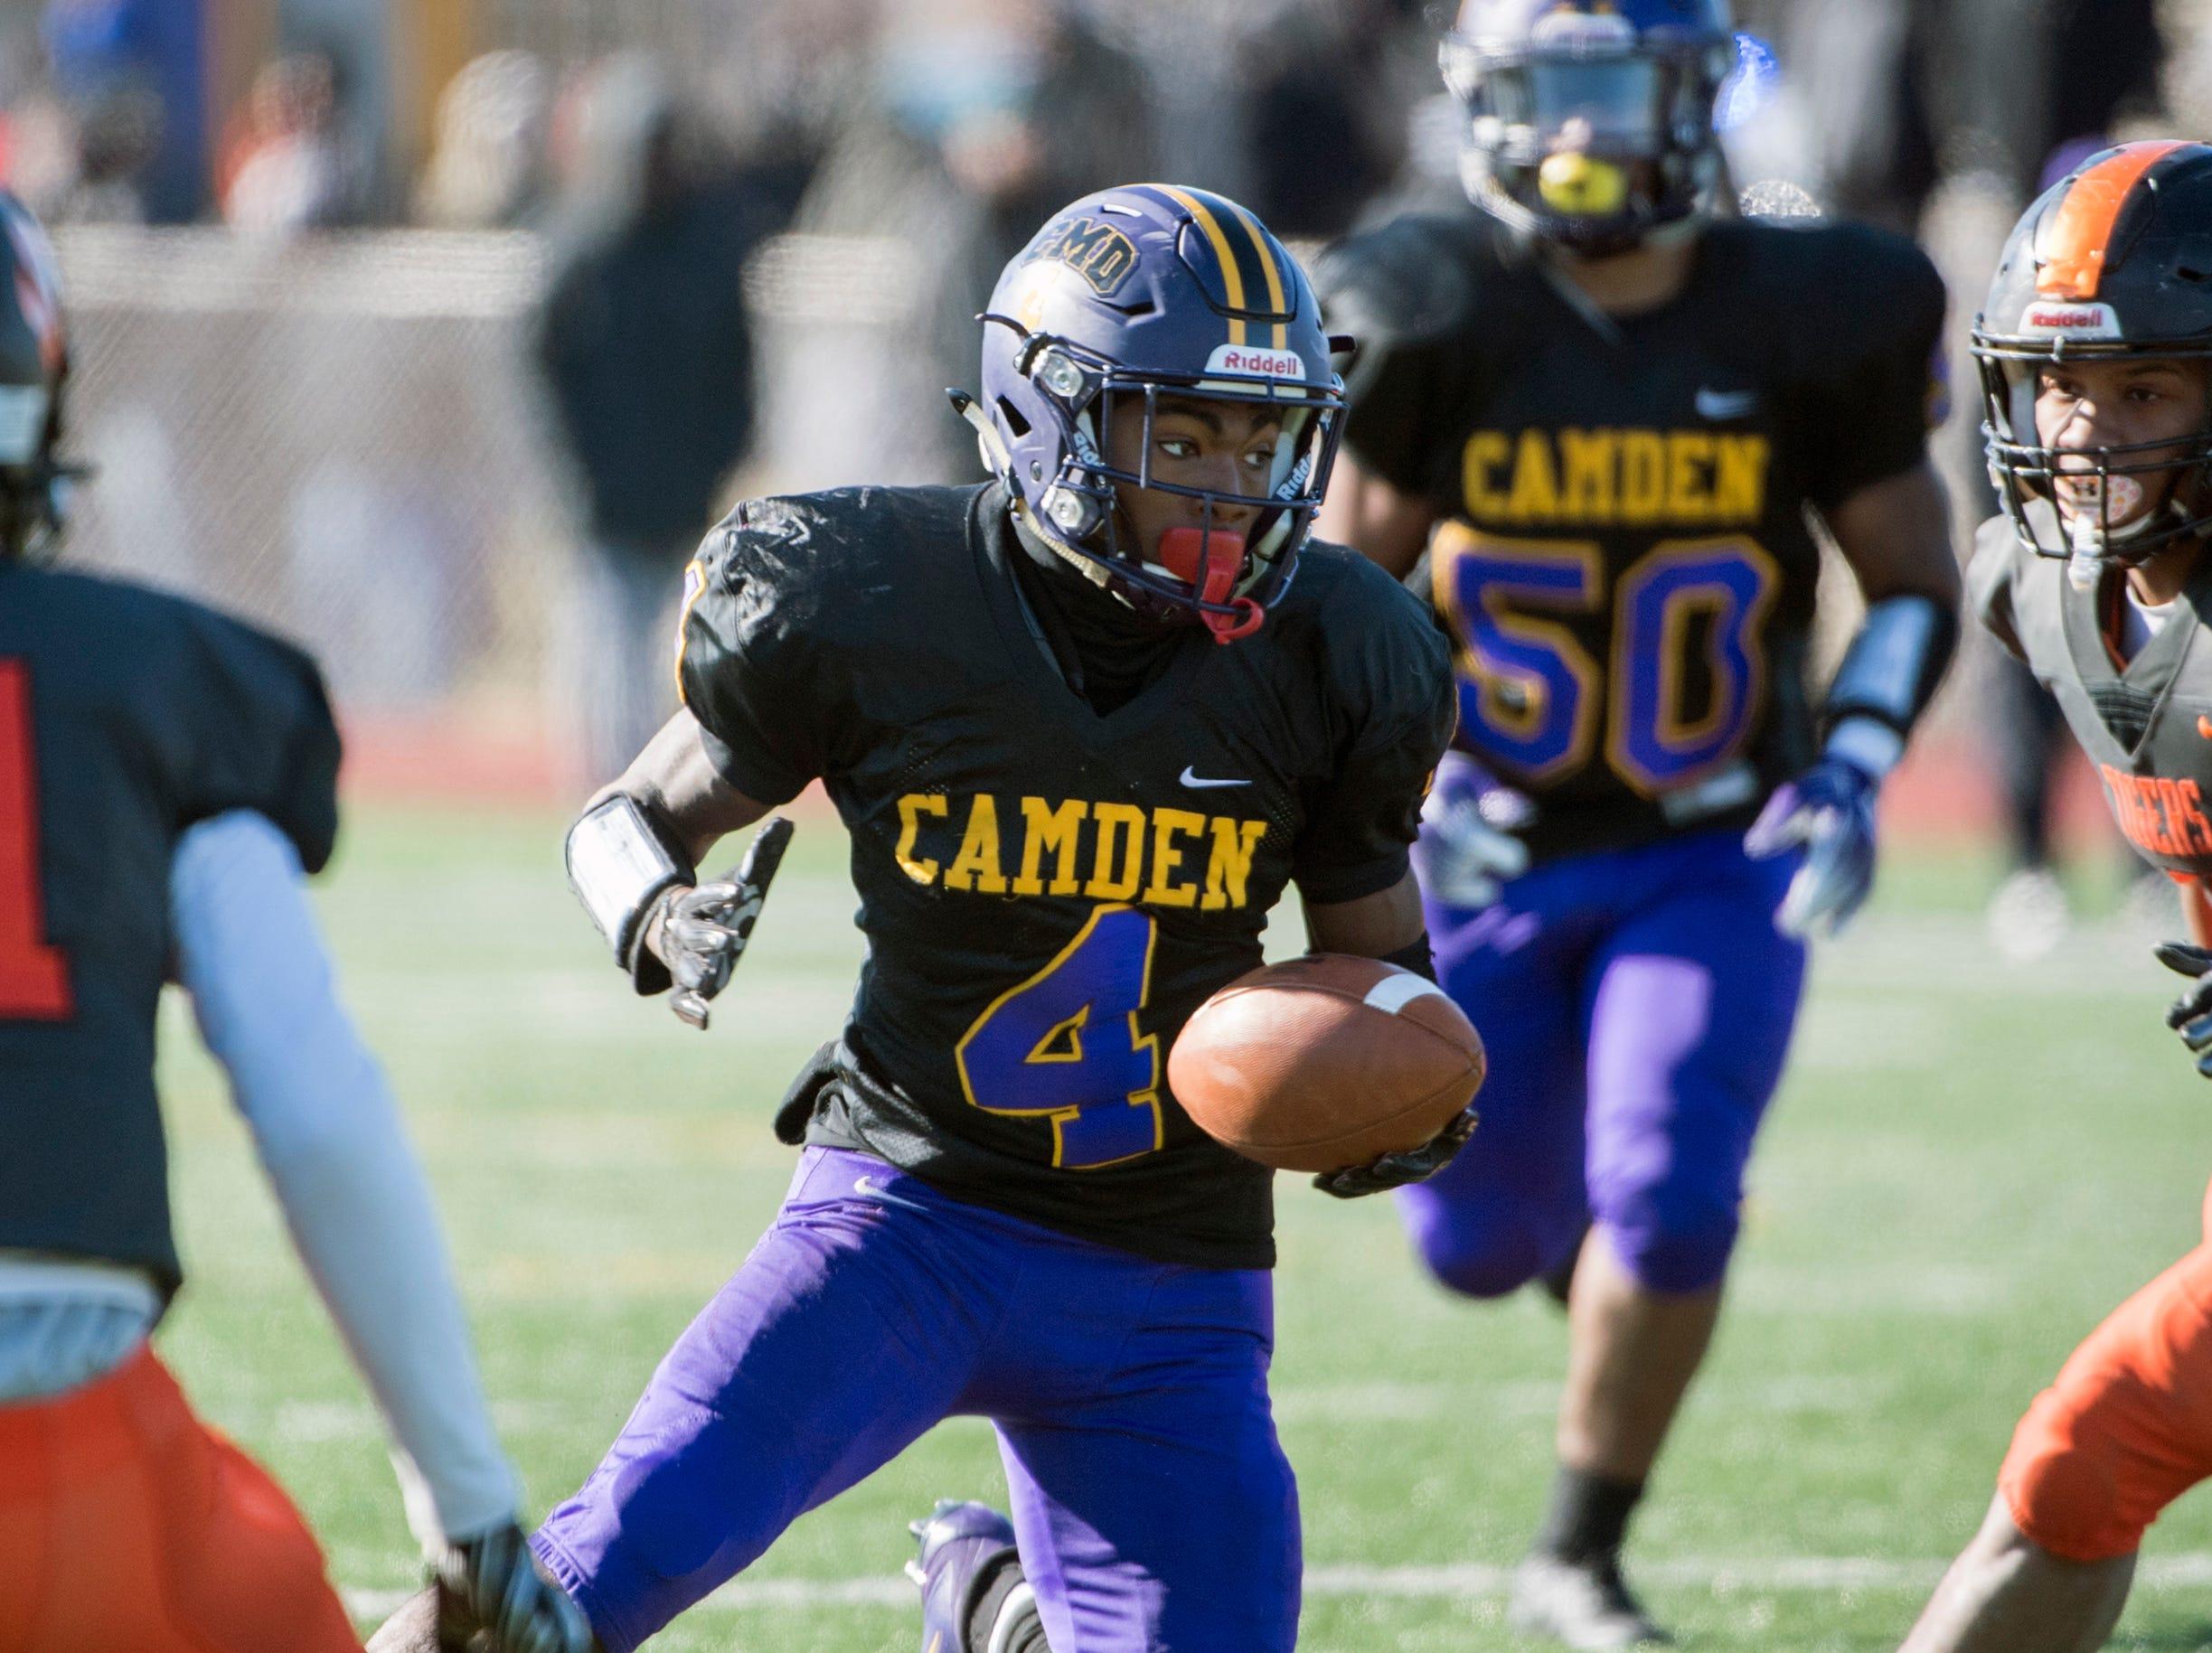 Camden's Jajuan Hudson (4) rushes during an annual Camden-Woodrow Wilson Thanksgiving game Thursday, Nov. 22, 2018 in Camden, N.J. Camden won 39-28.